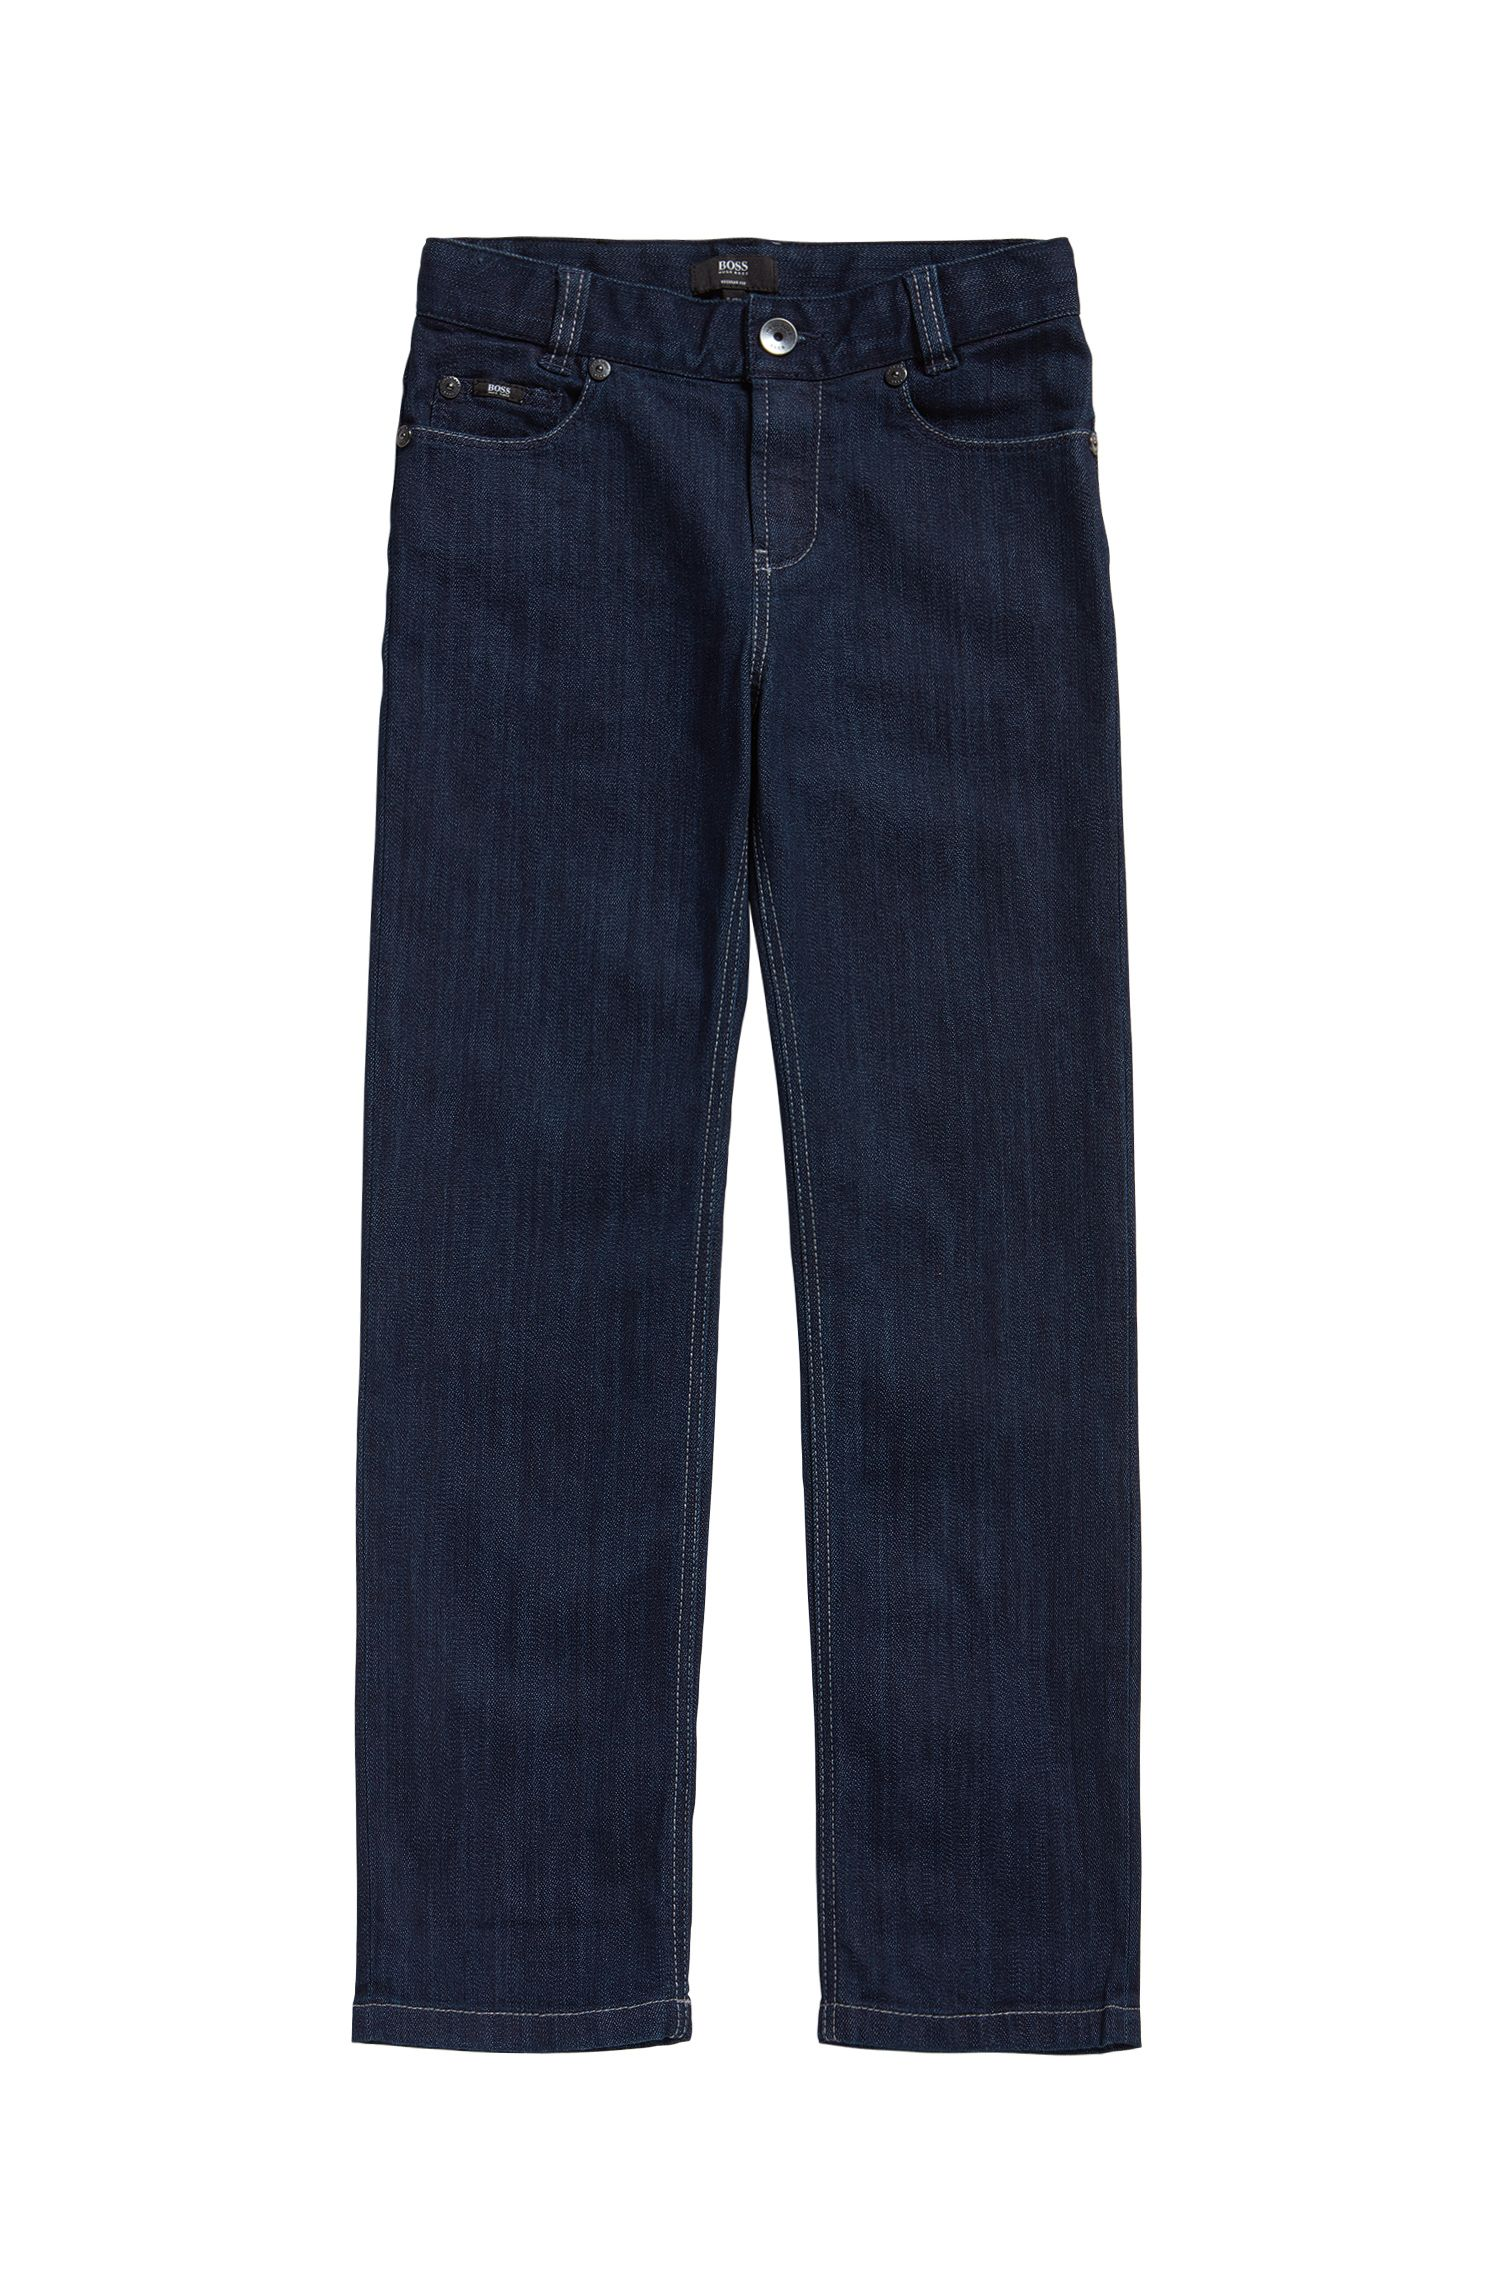 'J24425' | Boys Stretch Cotton Blend Jeans